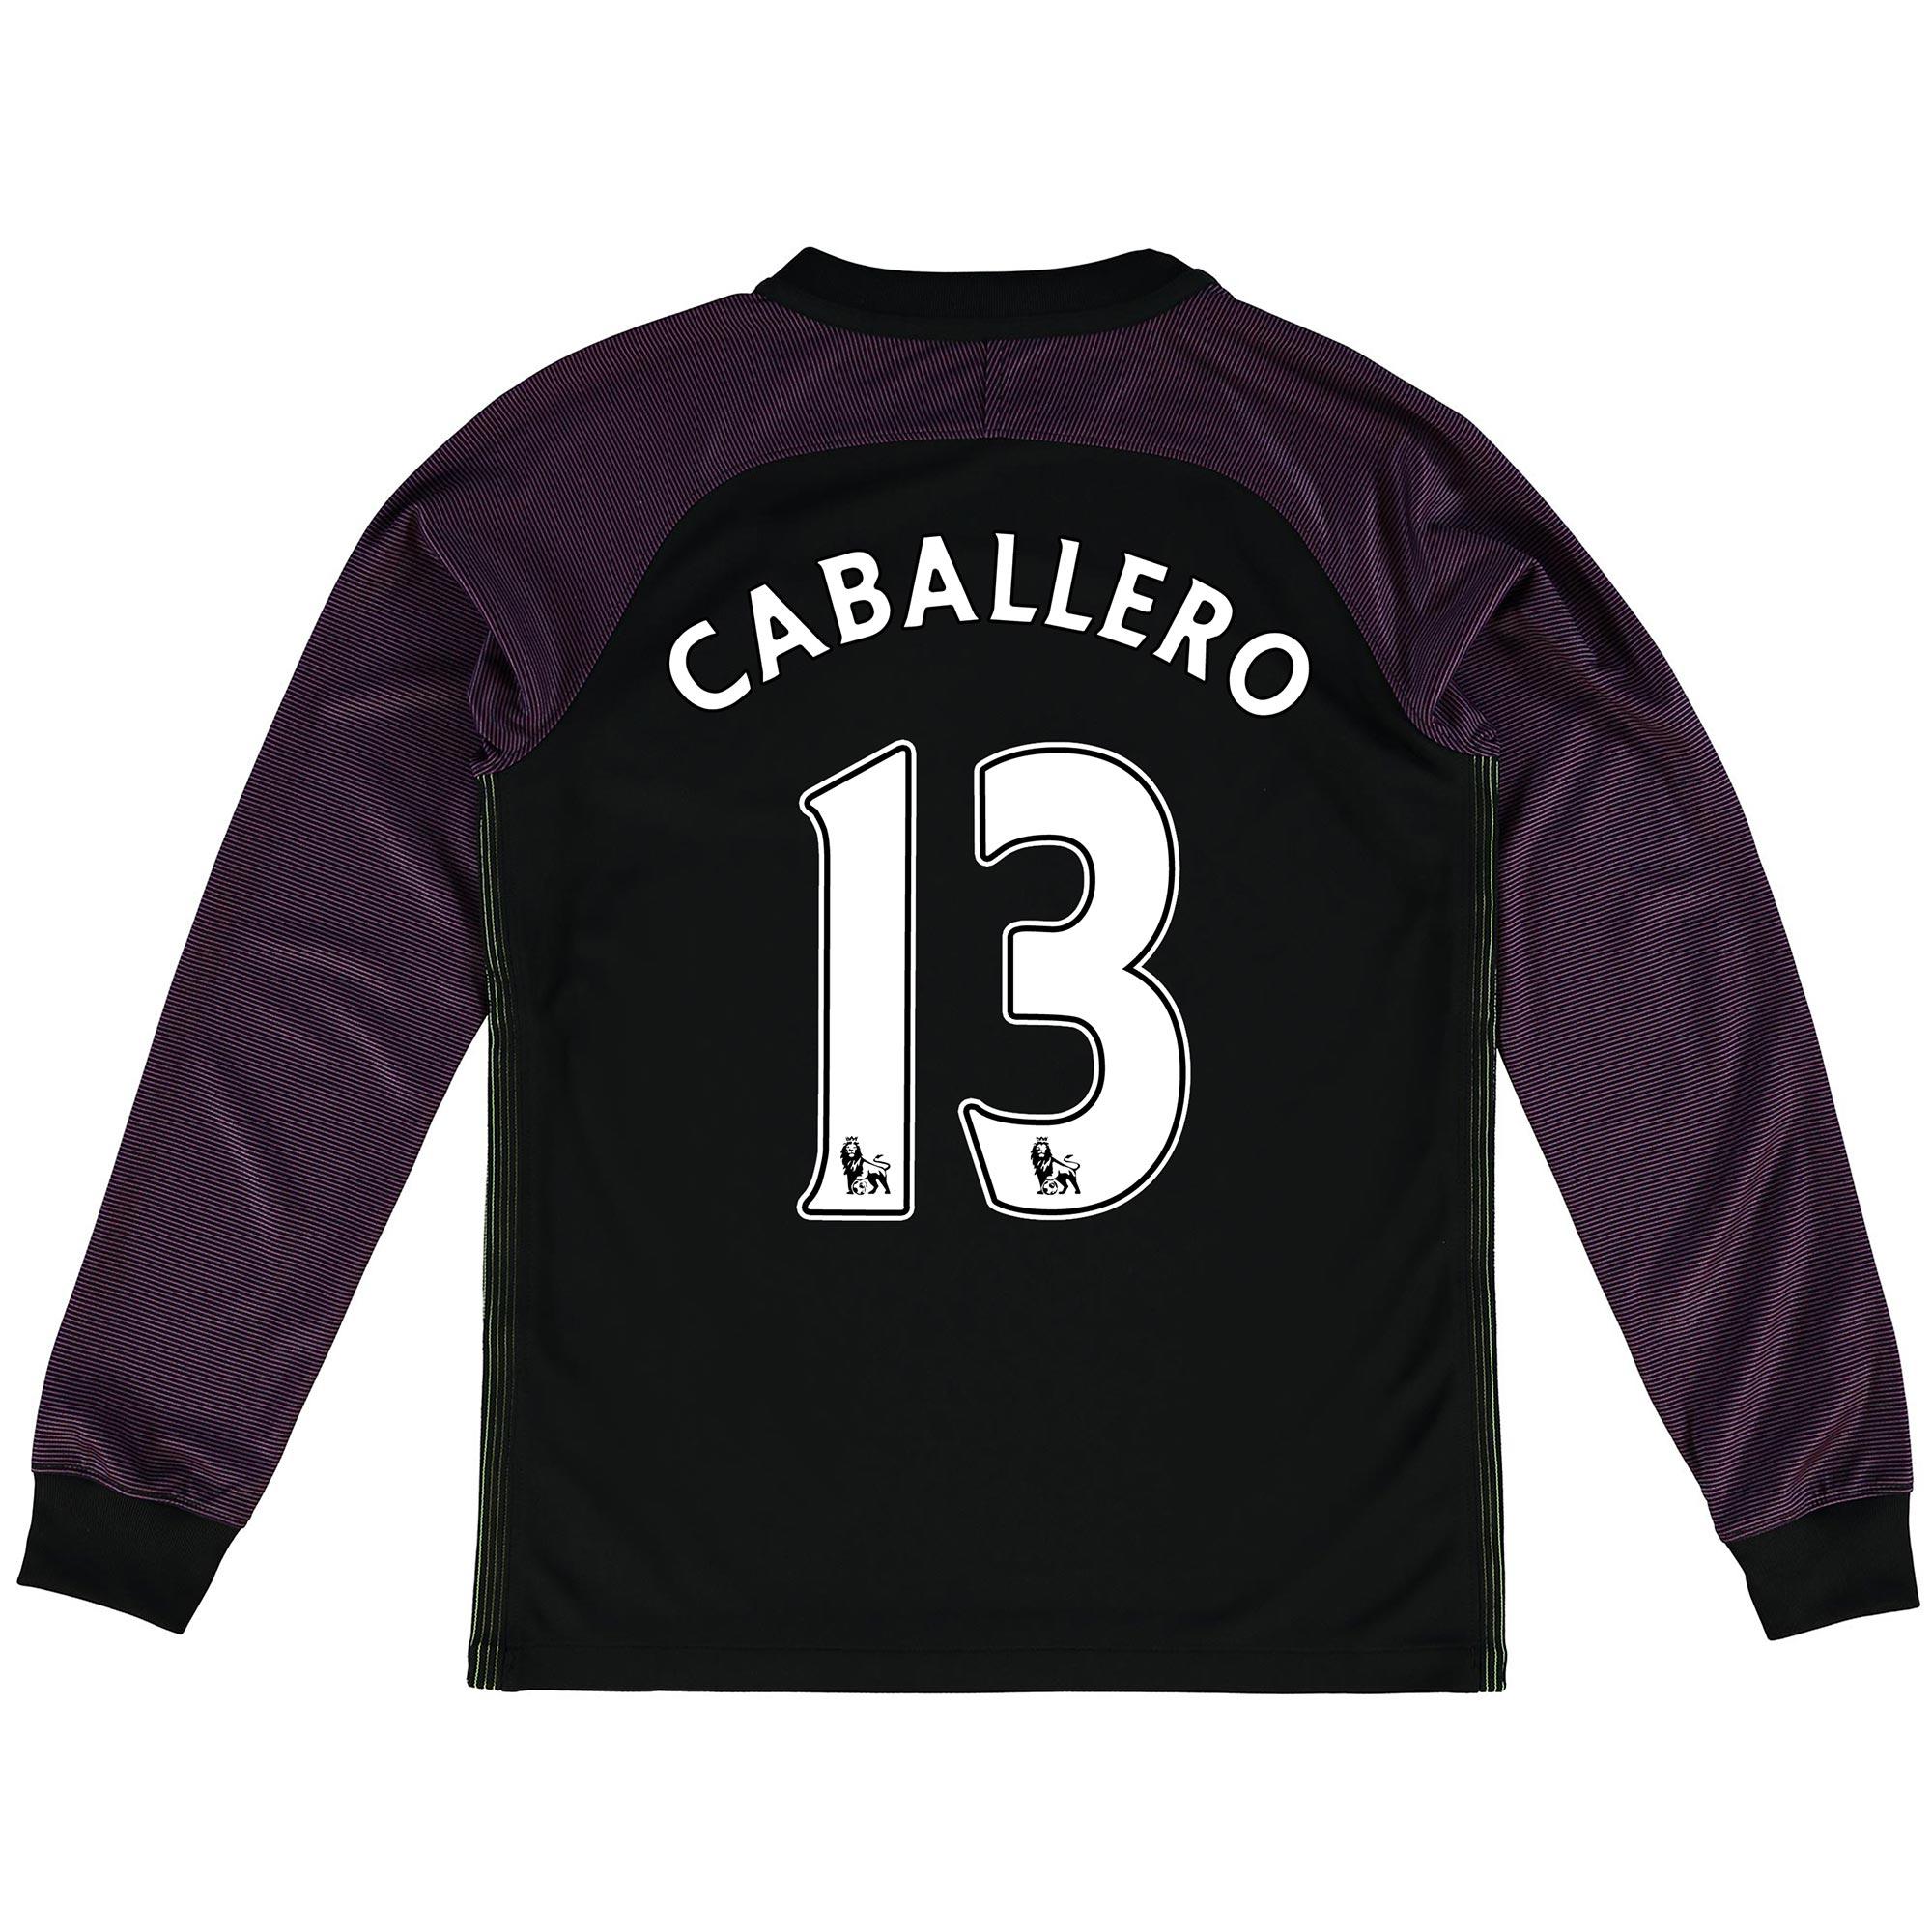 Manchester City Stadium Goalkeeper Shirt 2016-17 - Kids with Caballero